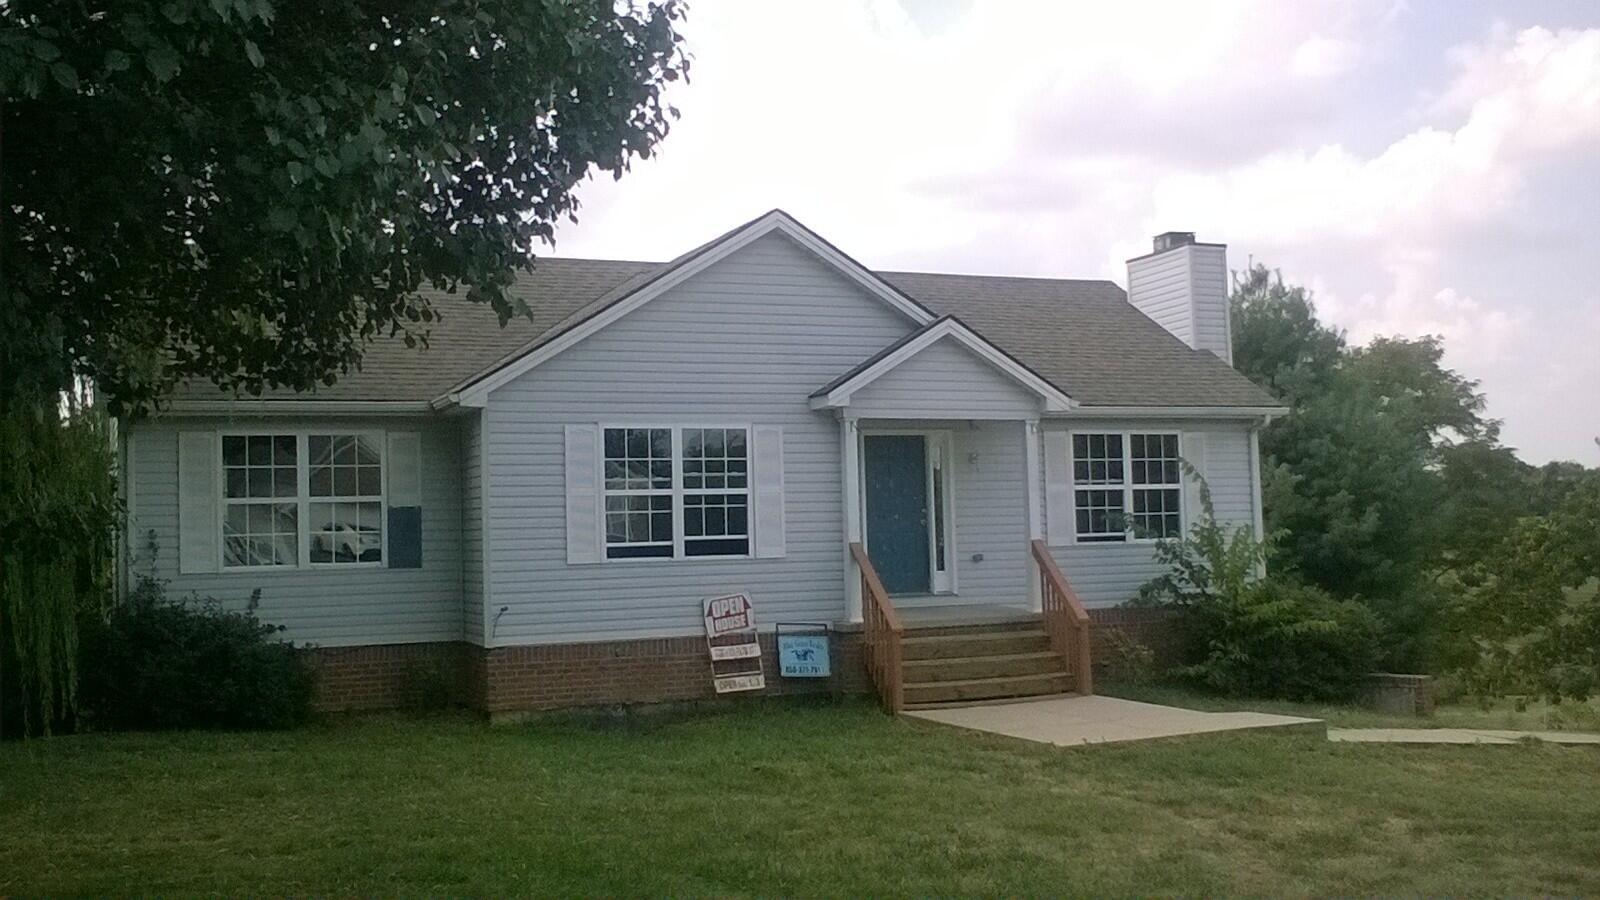 143 Indian Springs, Lancaster, Kentucky 40444, 5 Bedrooms Bedrooms, ,3 BathroomsBathrooms,Residential,For Sale,Indian Springs,20120556